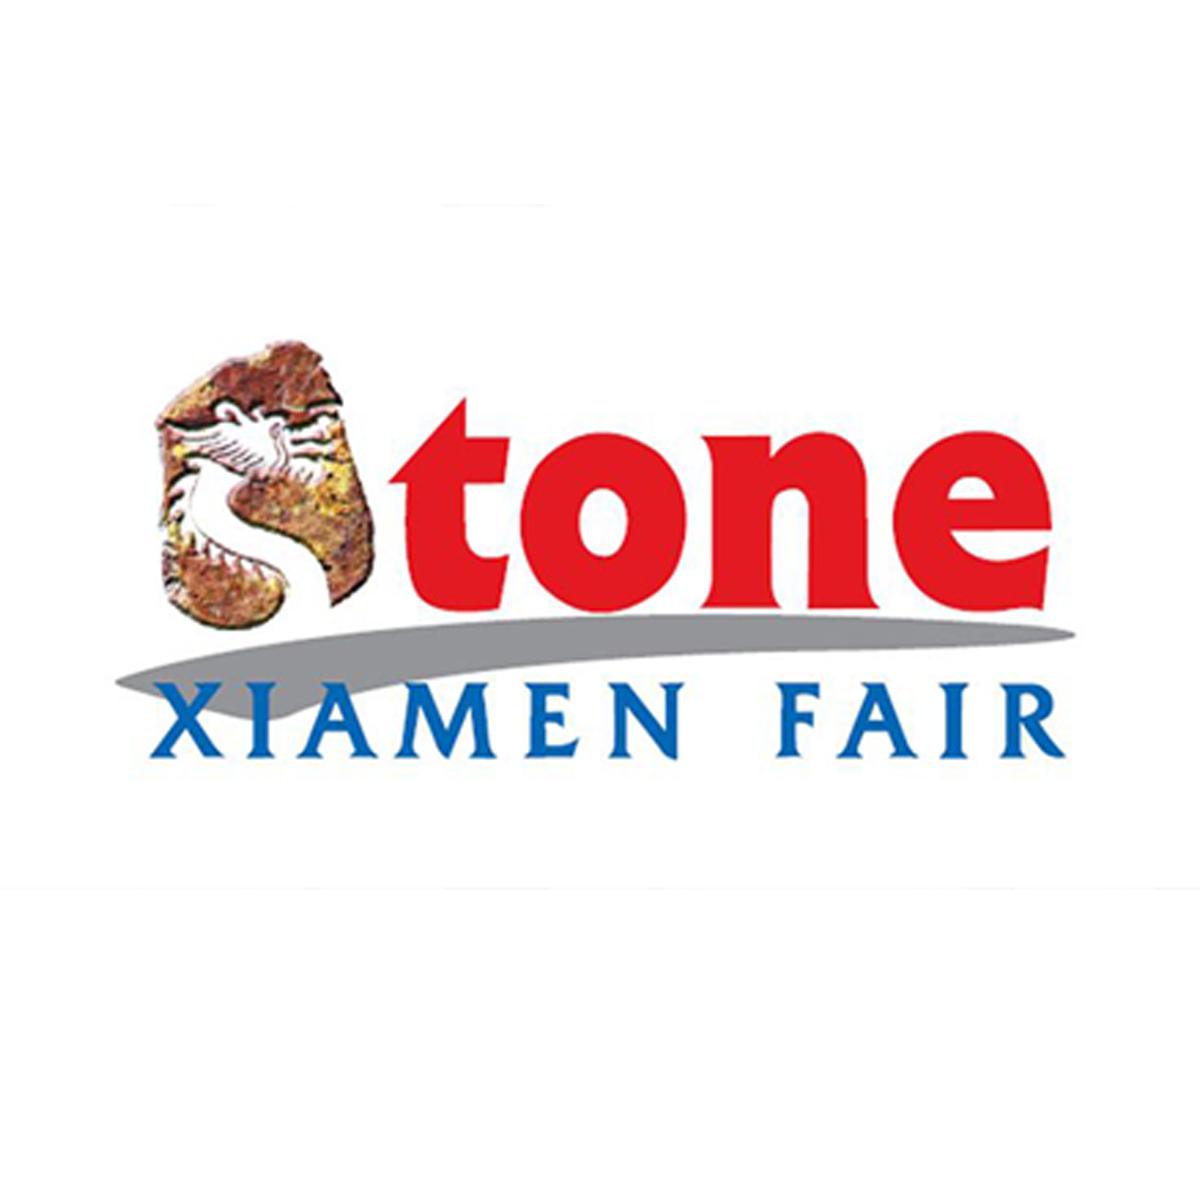 China Xiamen International Stone Fair 2019